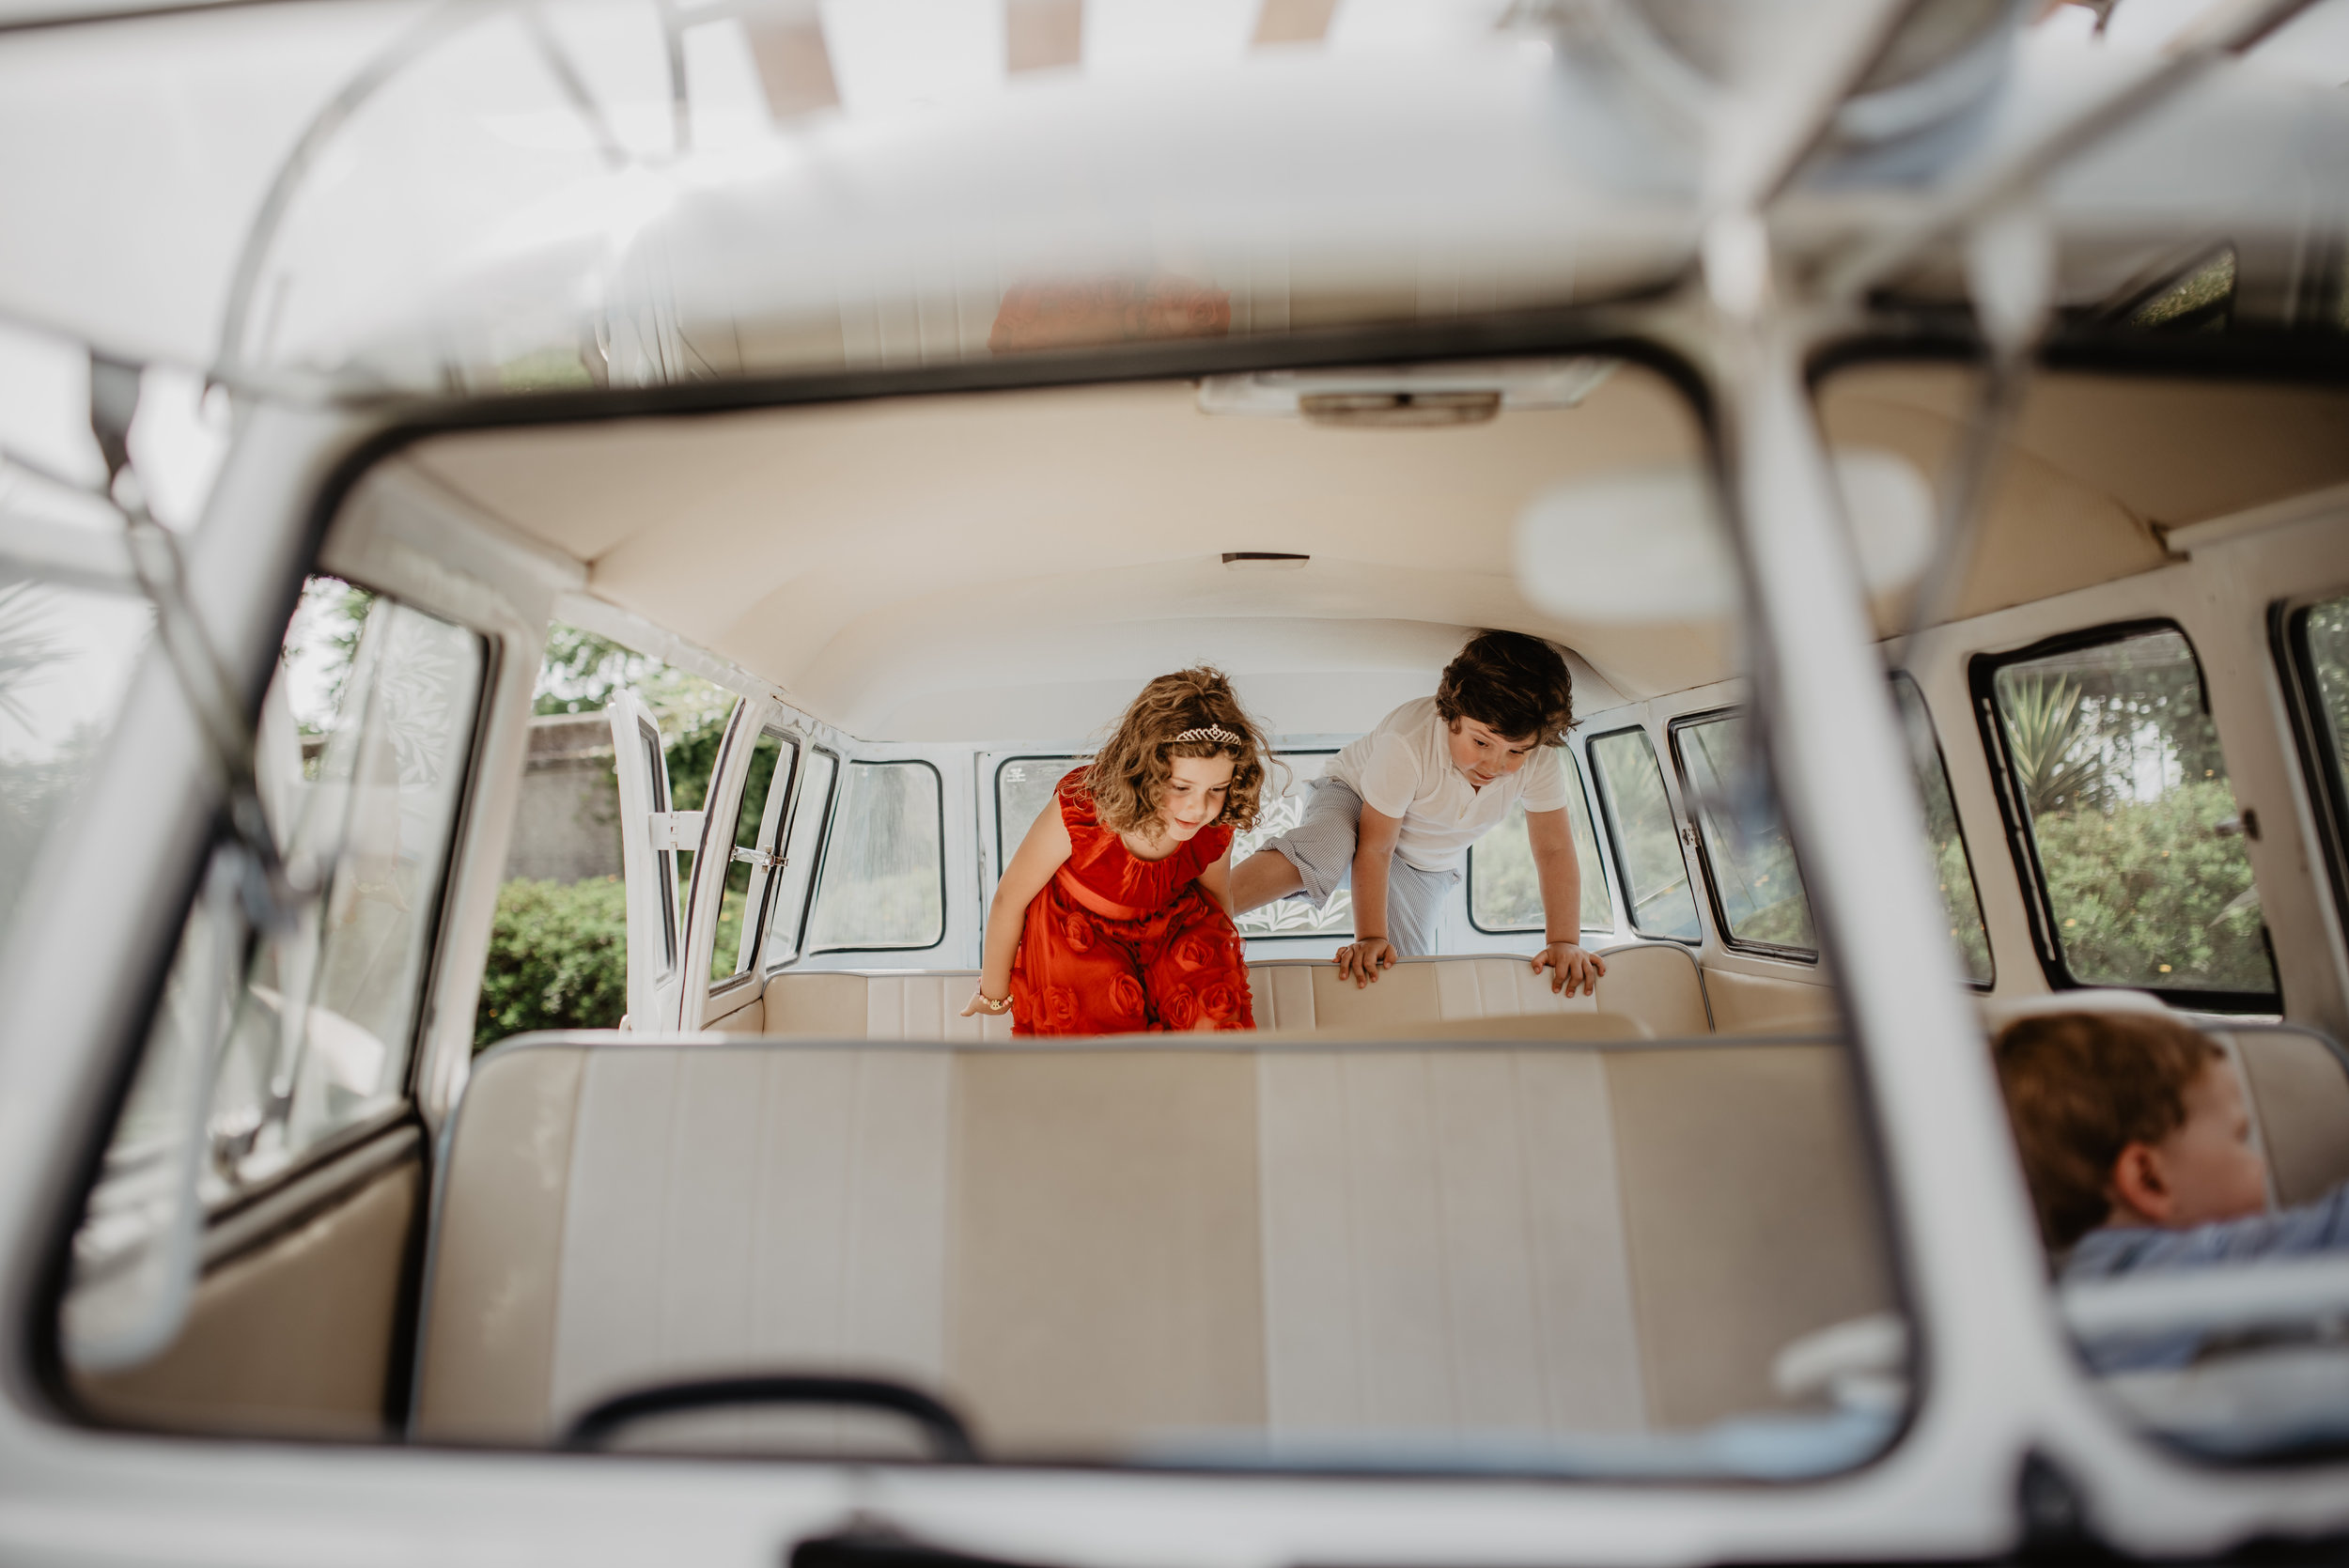 Lapela-photography-wedding-sintra-portugal-71.jpg